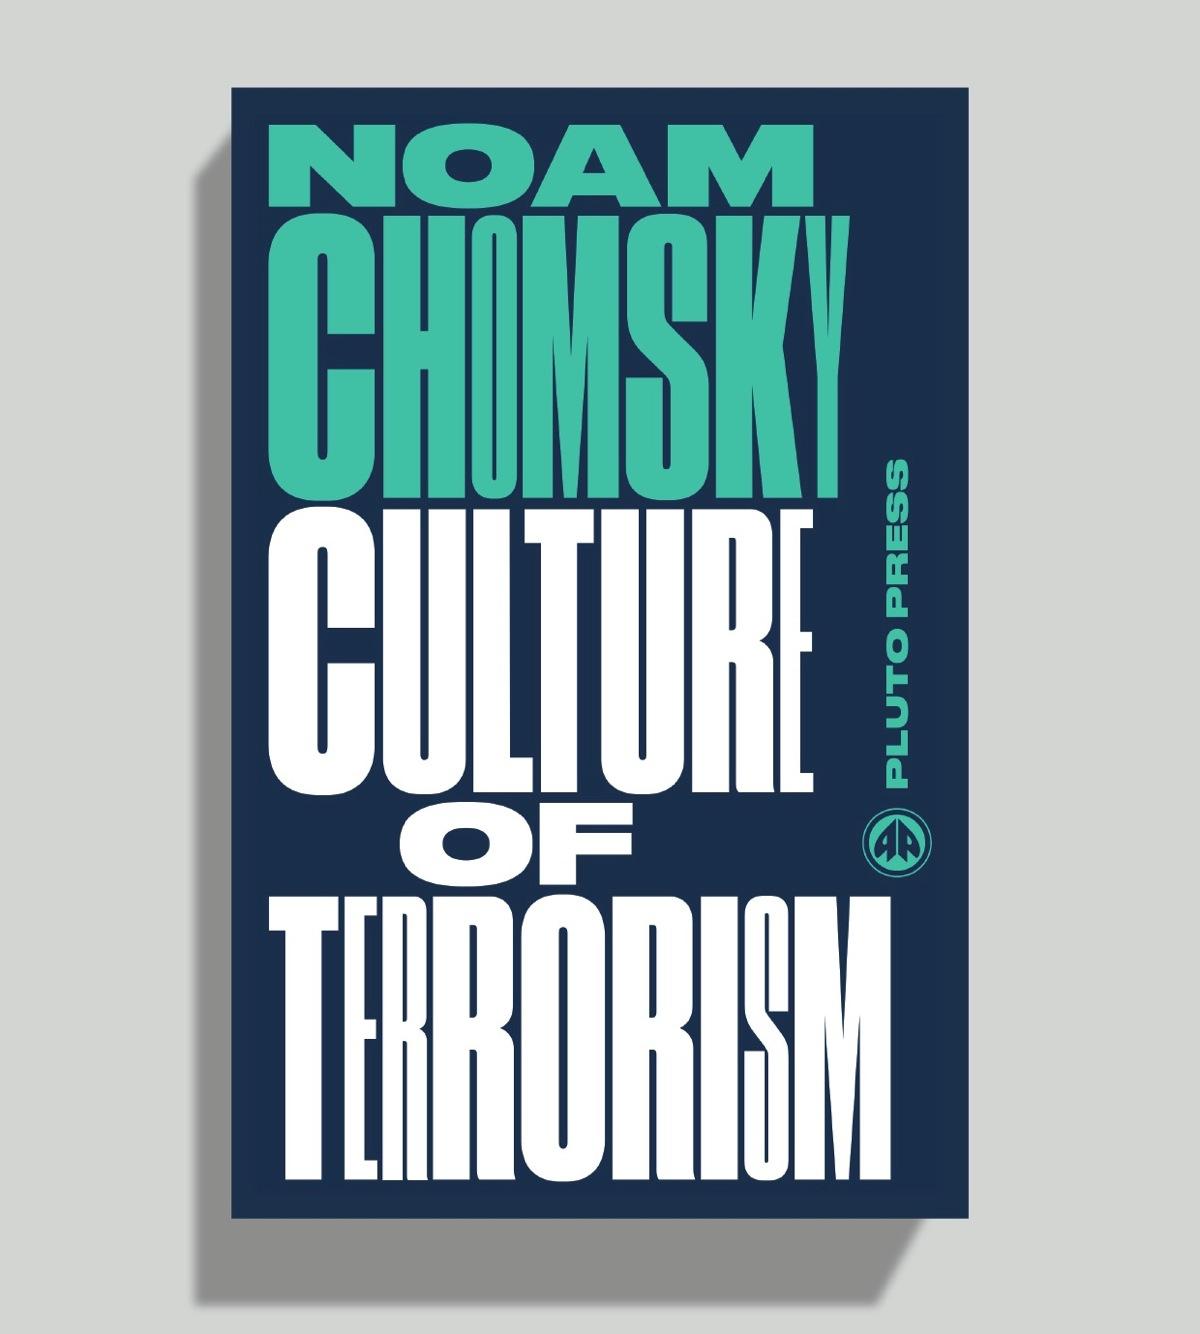 NoamChomskySeries(CultureOfTerrorism)1200